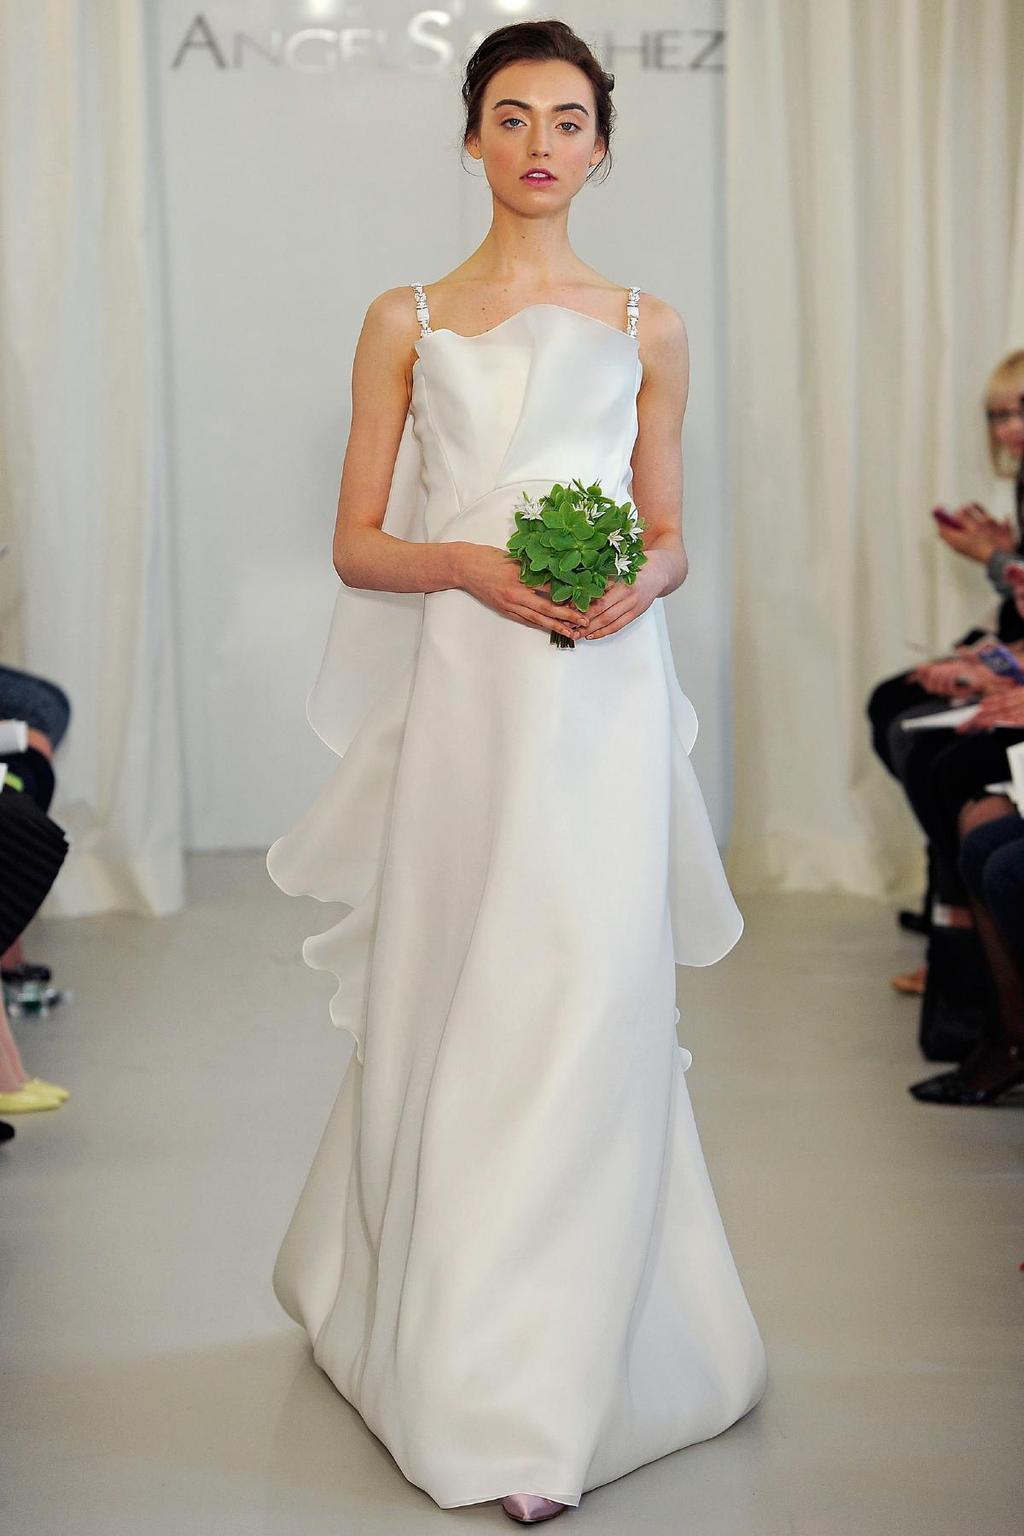 Angel-sanchez-wedding-dress-spring-2014-bridal-9.full